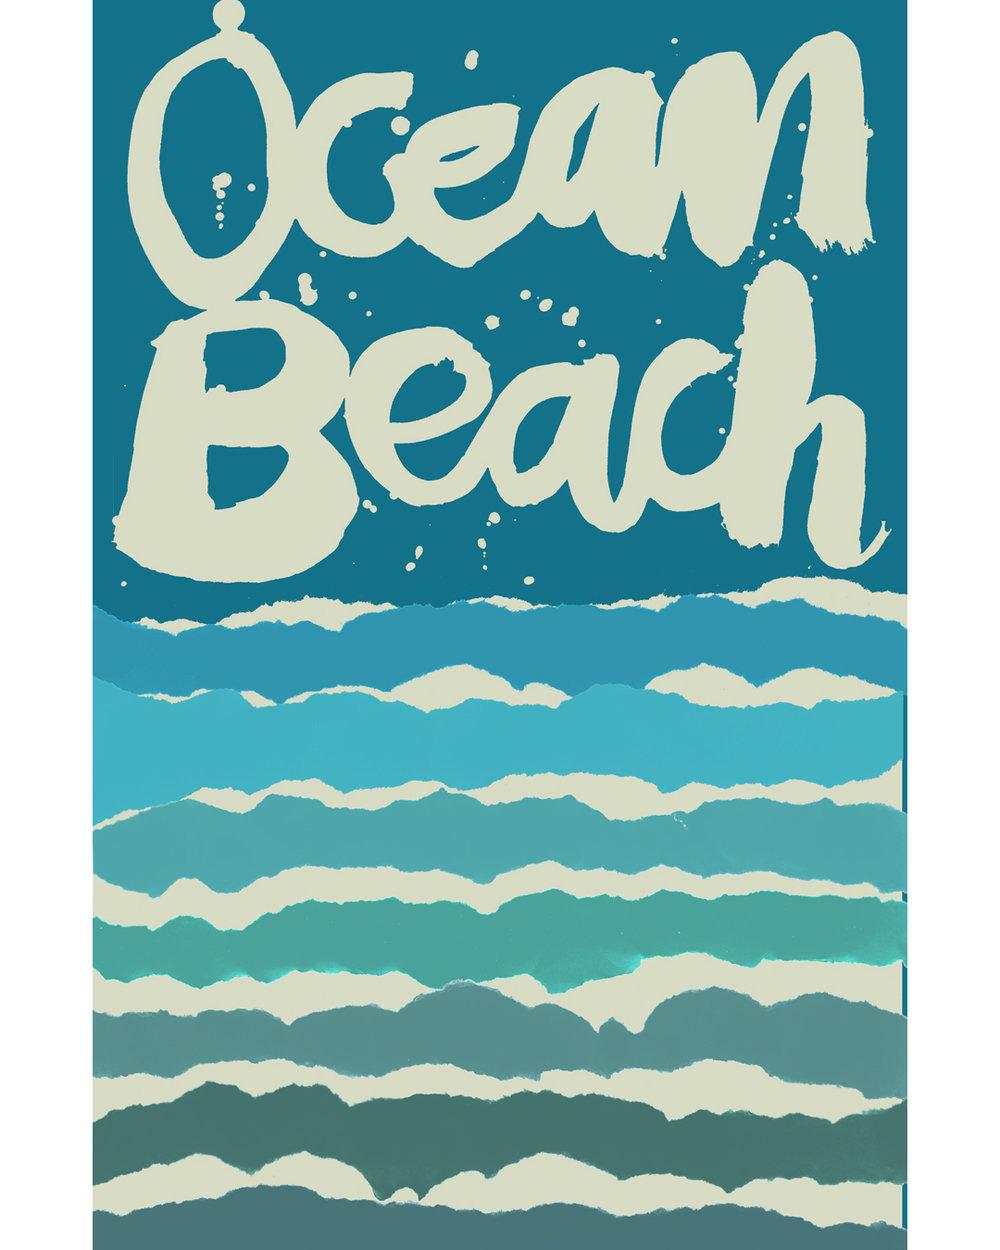 OceanBeach-inst.jpg